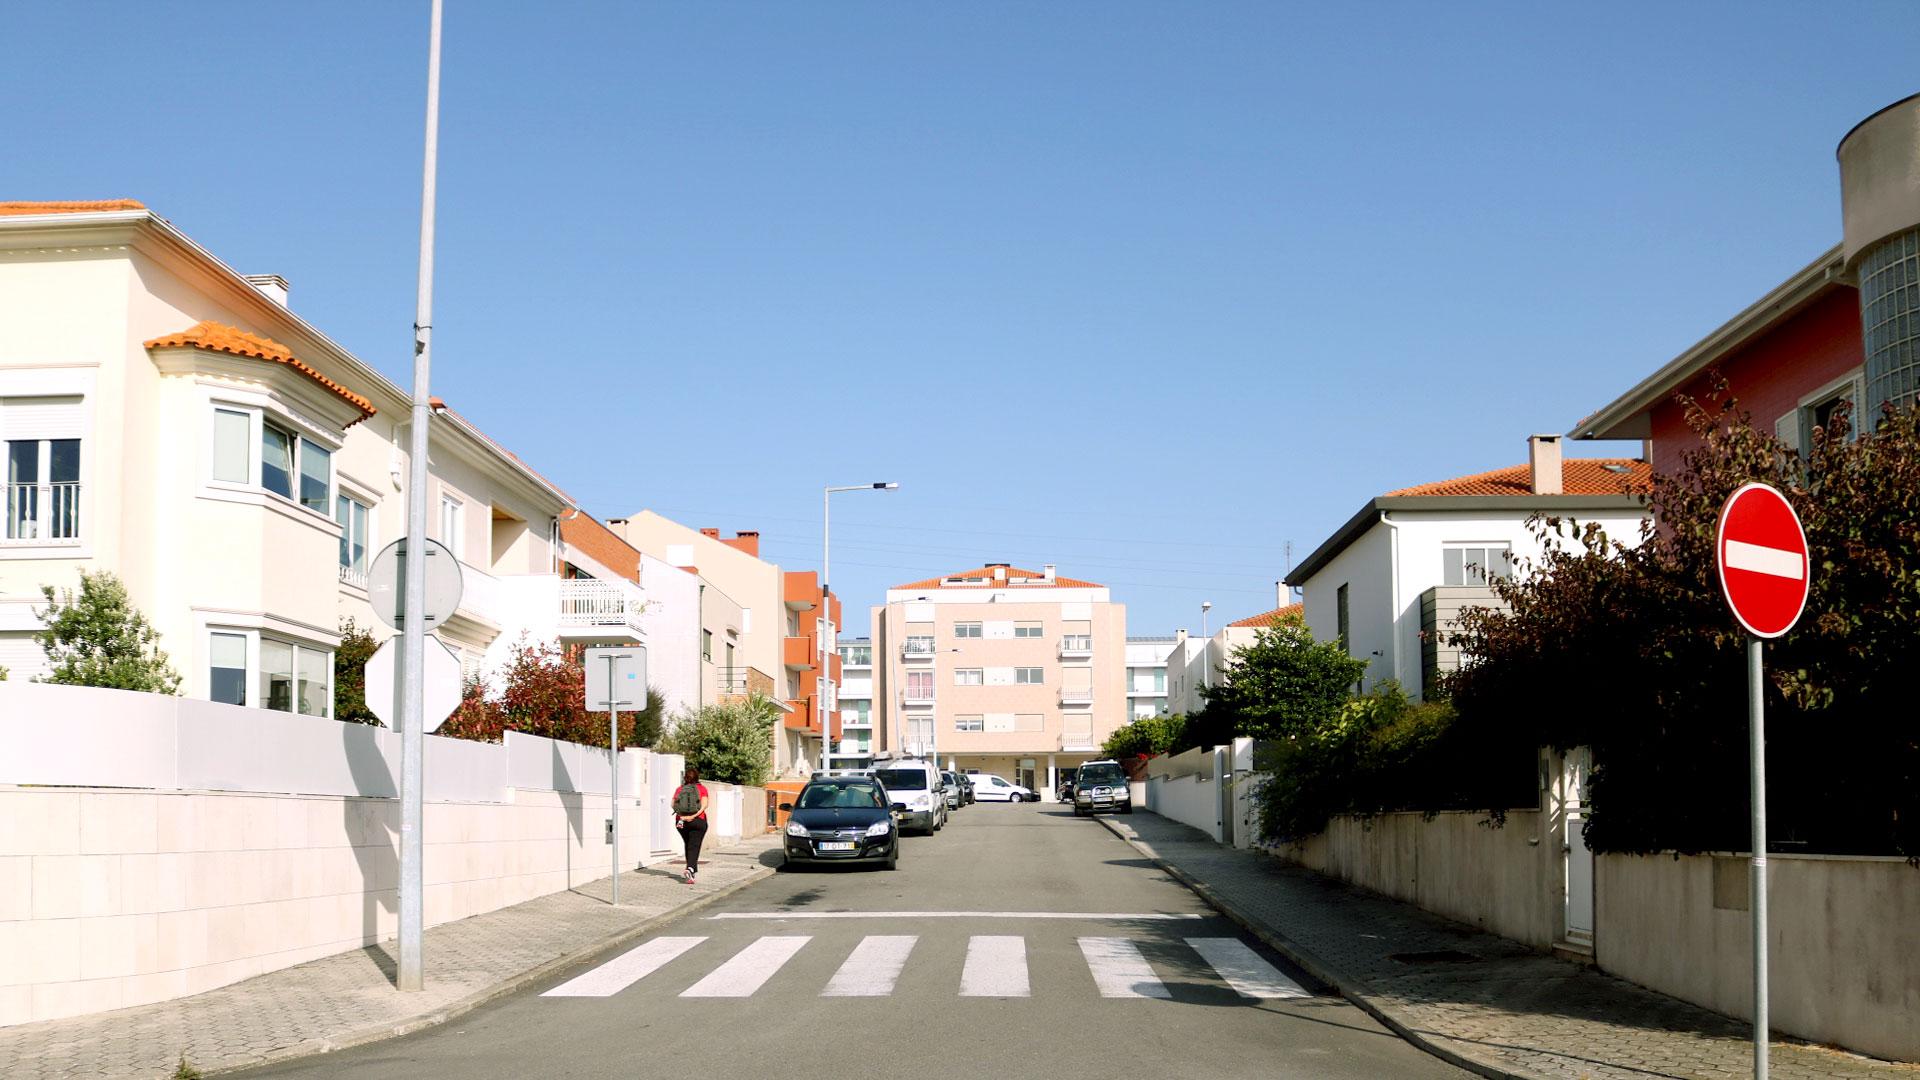 Forca-vouga-vera-cruz-Aveiro-ville-real-estate-imobiliaria-comprar-arrendar-vender-moradia-apartamento-casa-t0-t1-t2-t3-t4-5